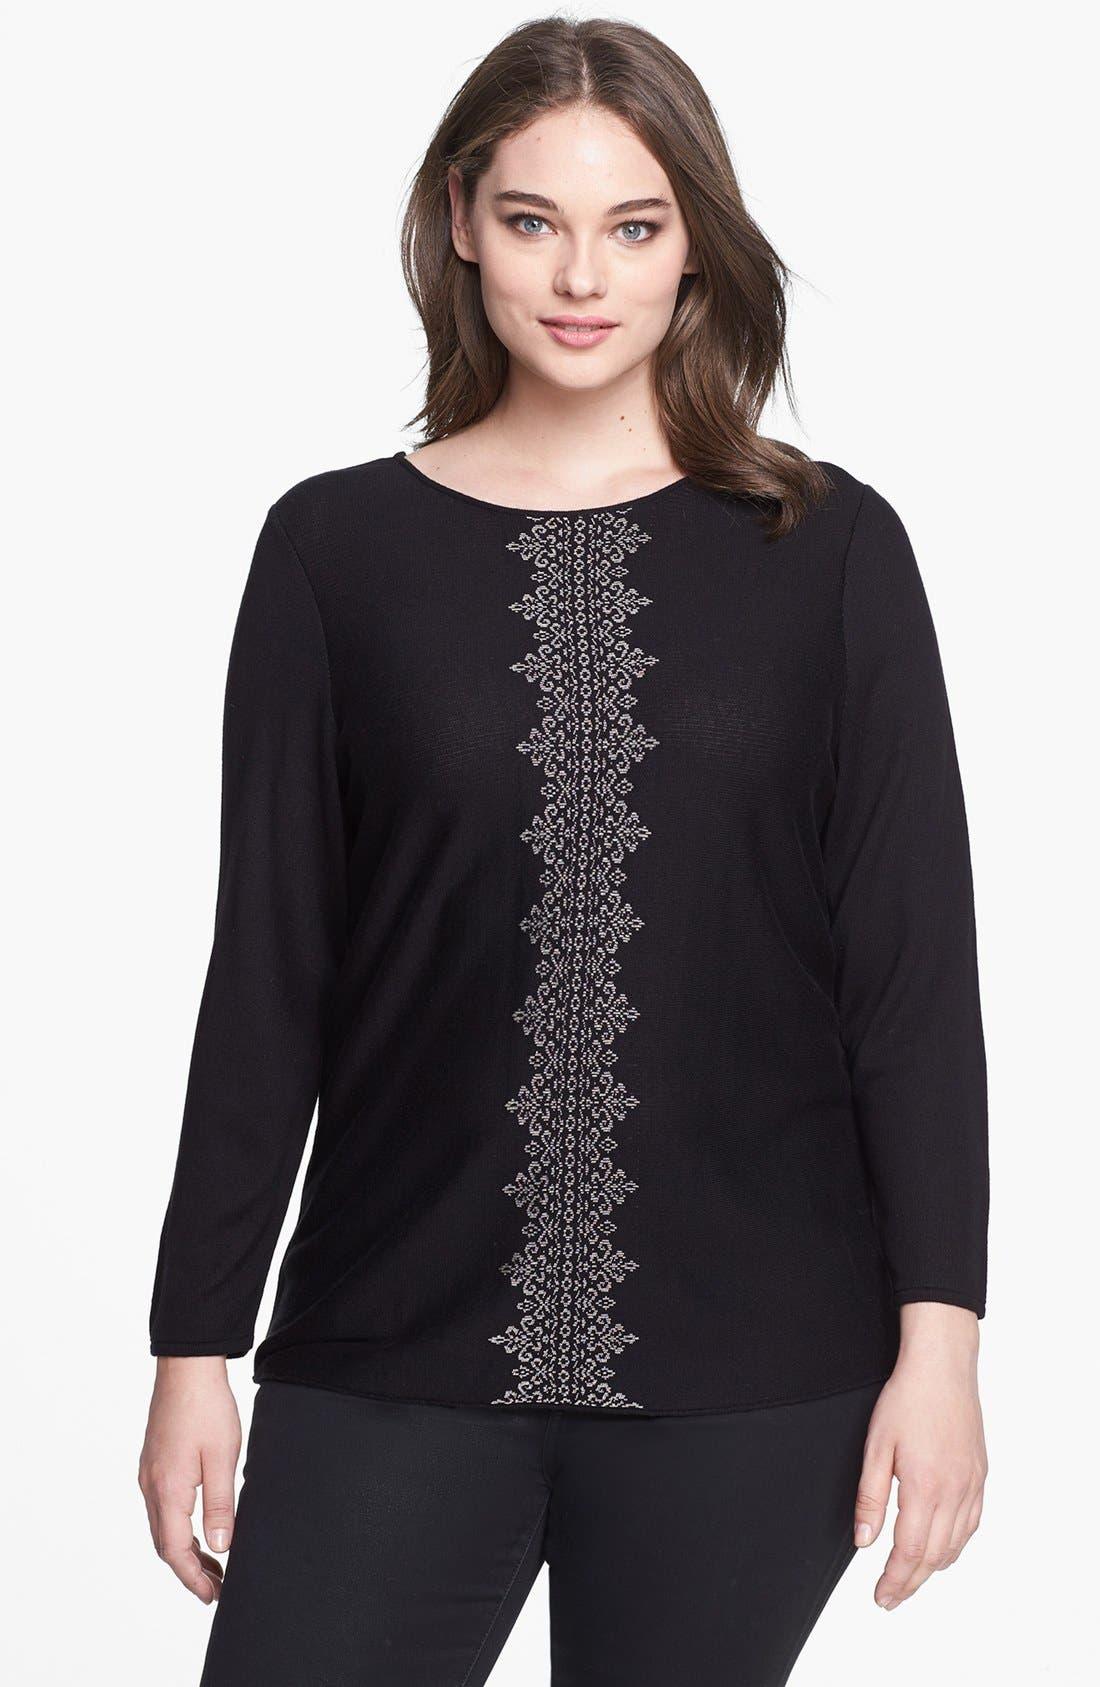 Alternate Image 1 Selected - NIC+ZOE Back Drape Sweater (Plus Size)